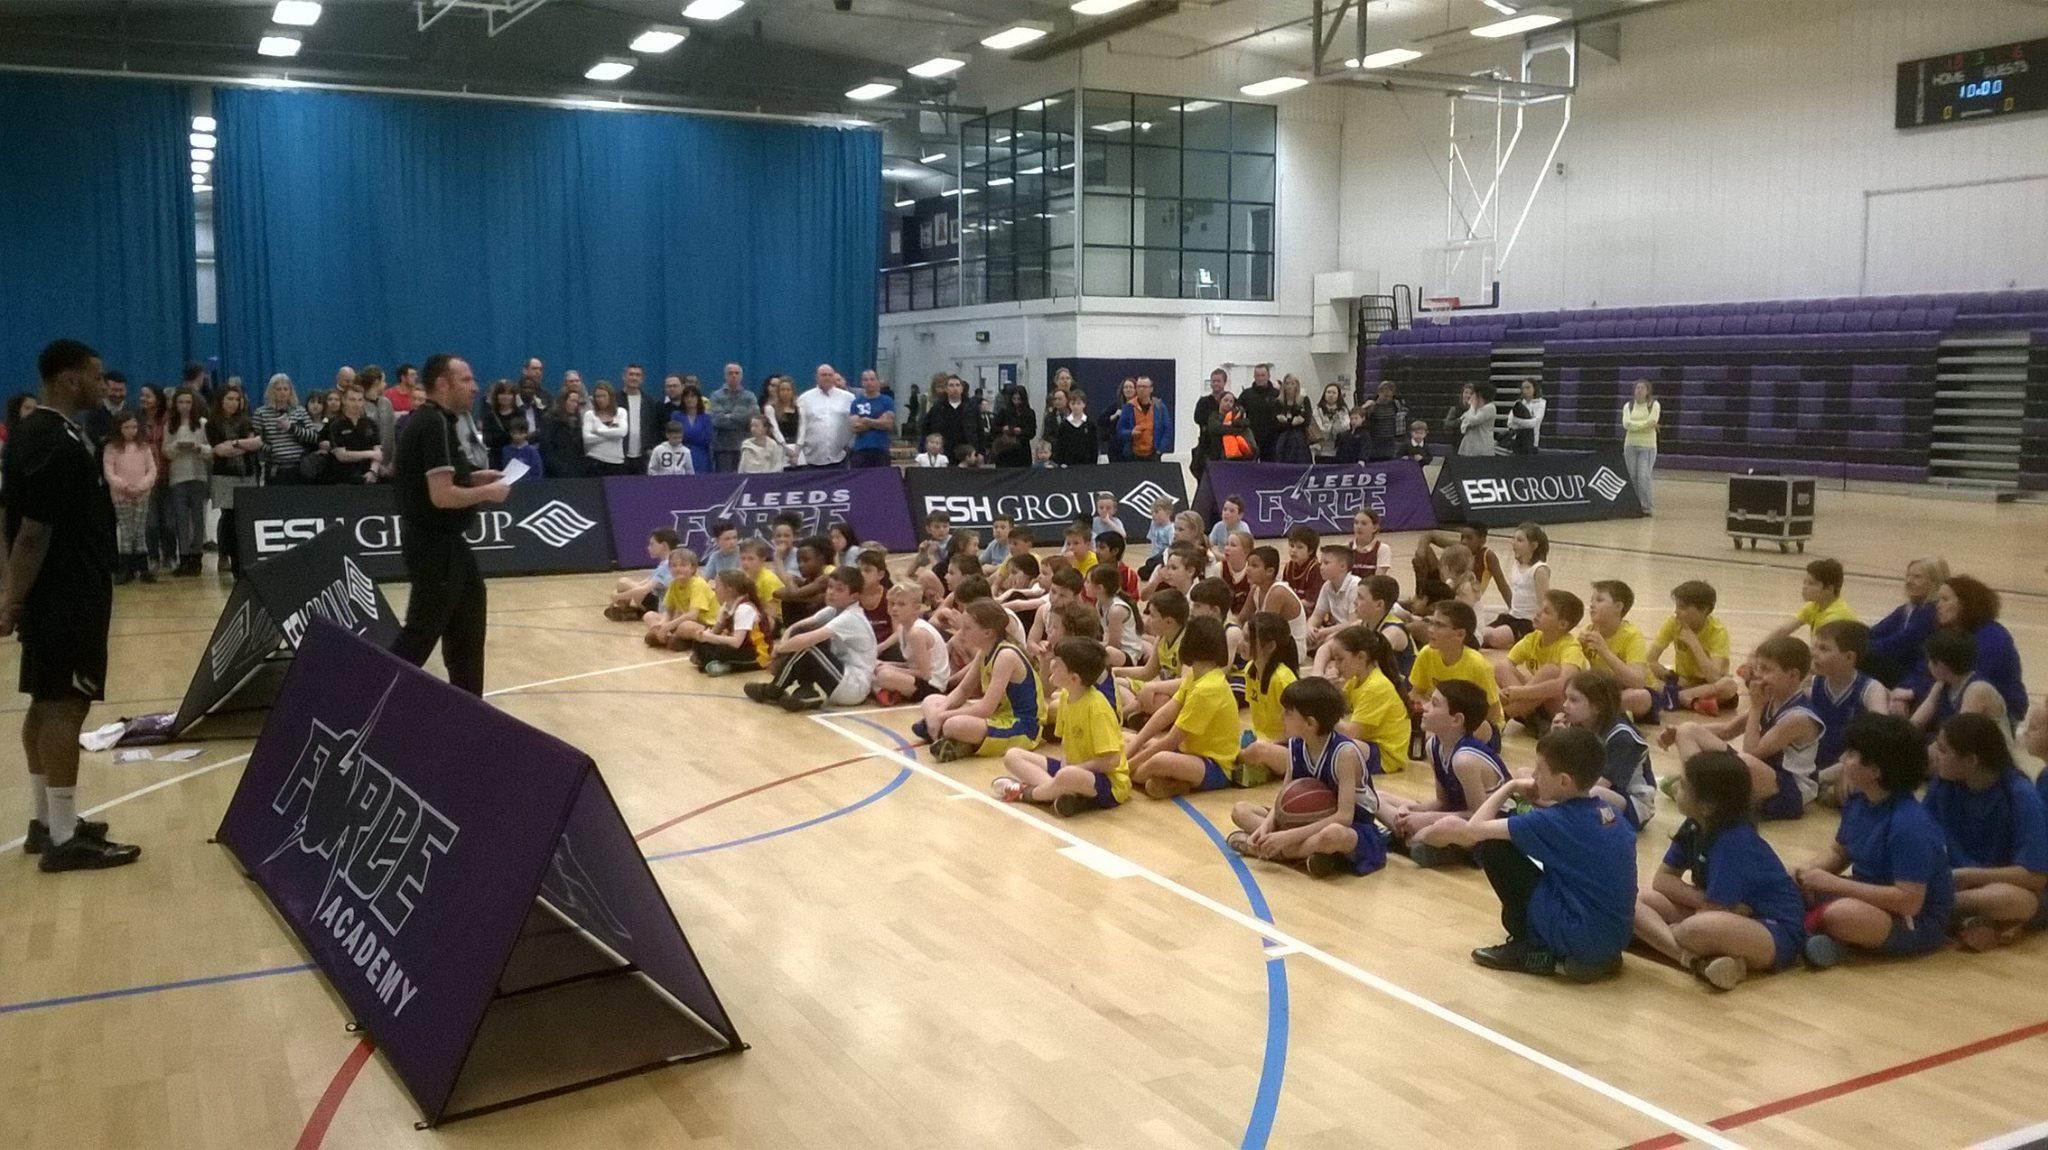 Leeds North West Basketball Y4 5 Finals 2014-15